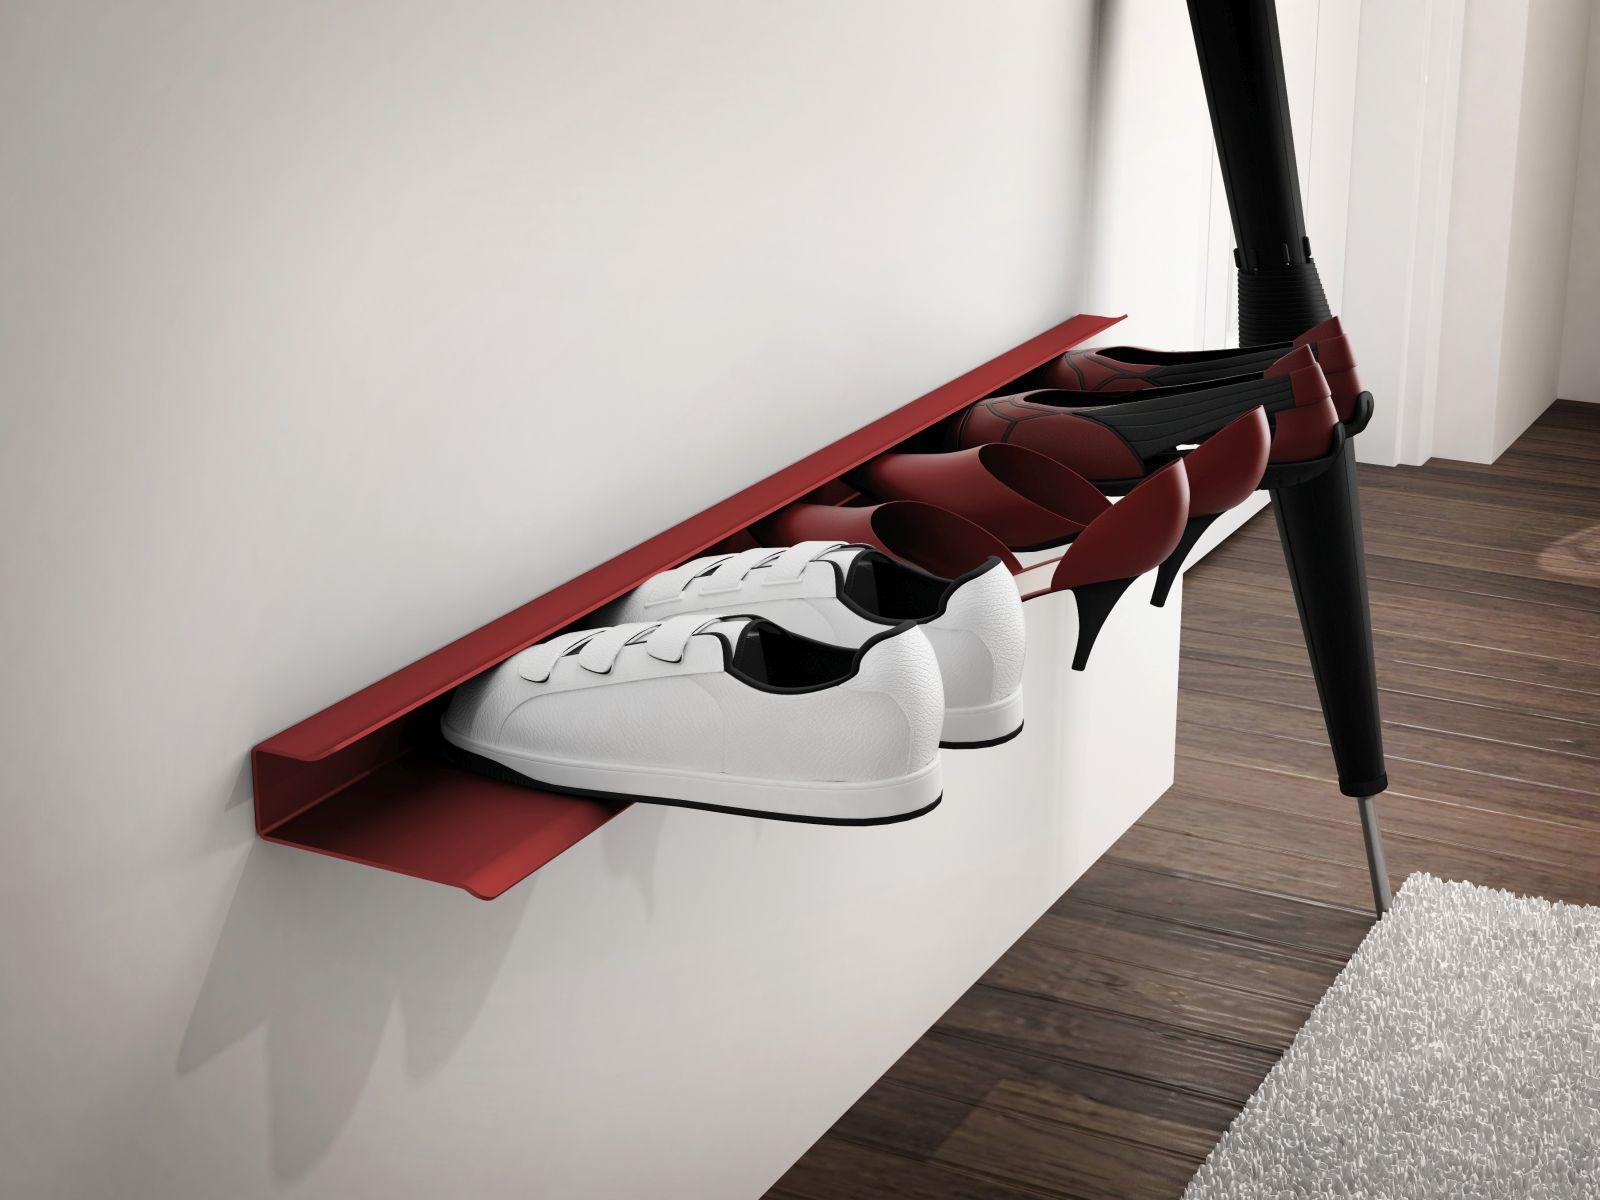 Nástěnná police na boty Sko, 85 cm, červená